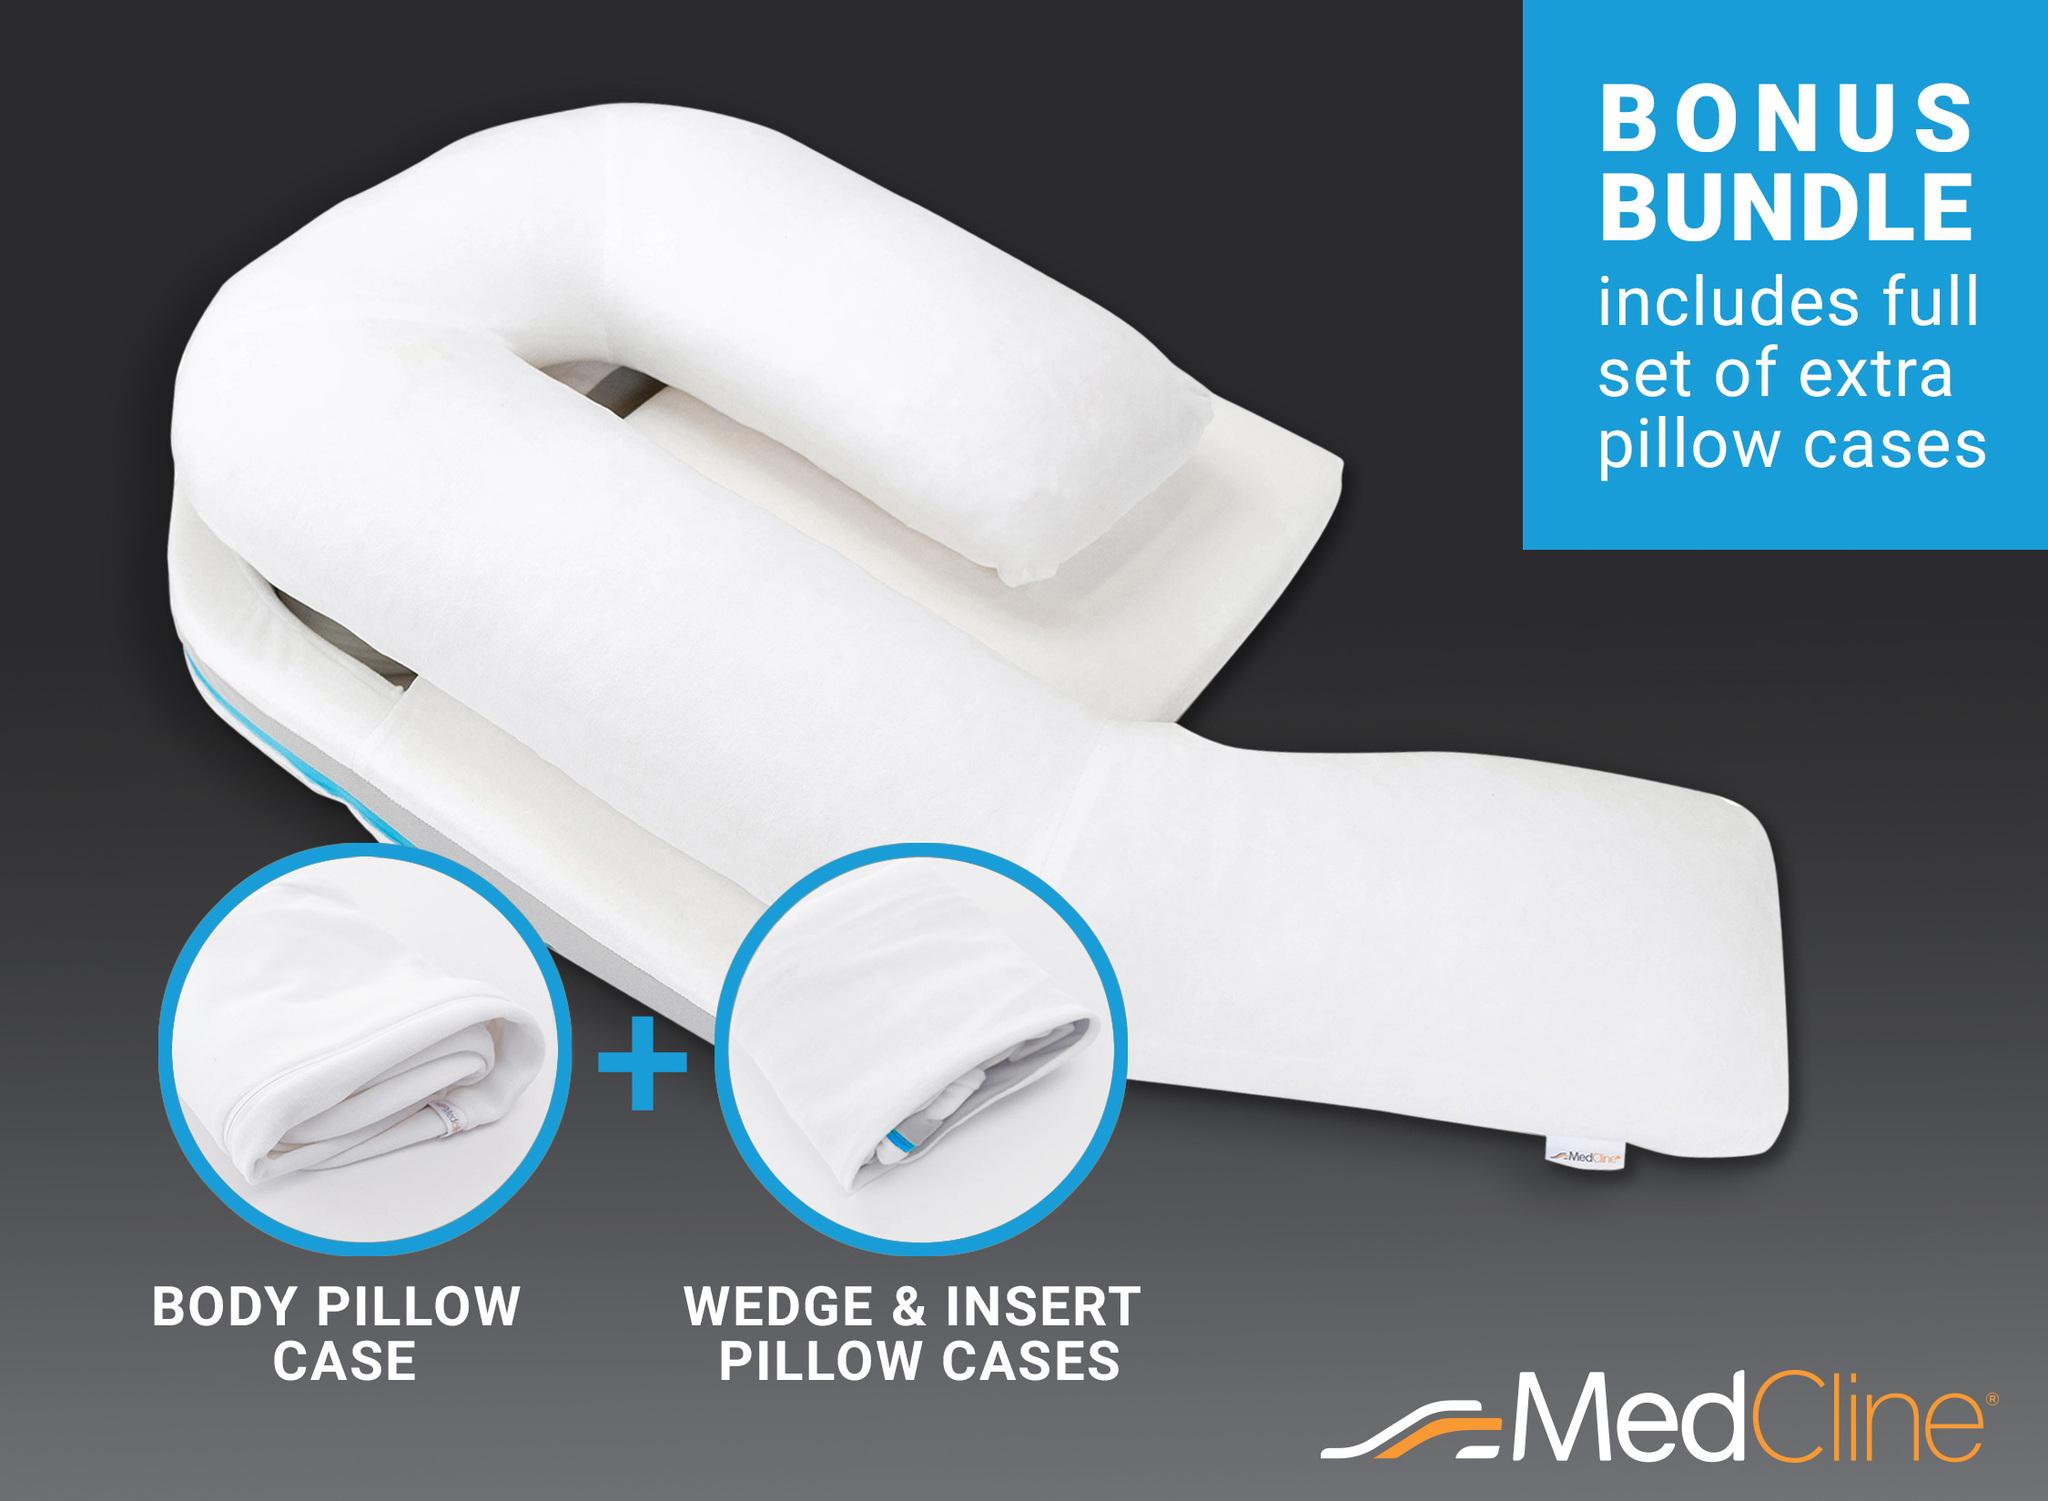 medcline shoulder relief system extra cases bundle one size